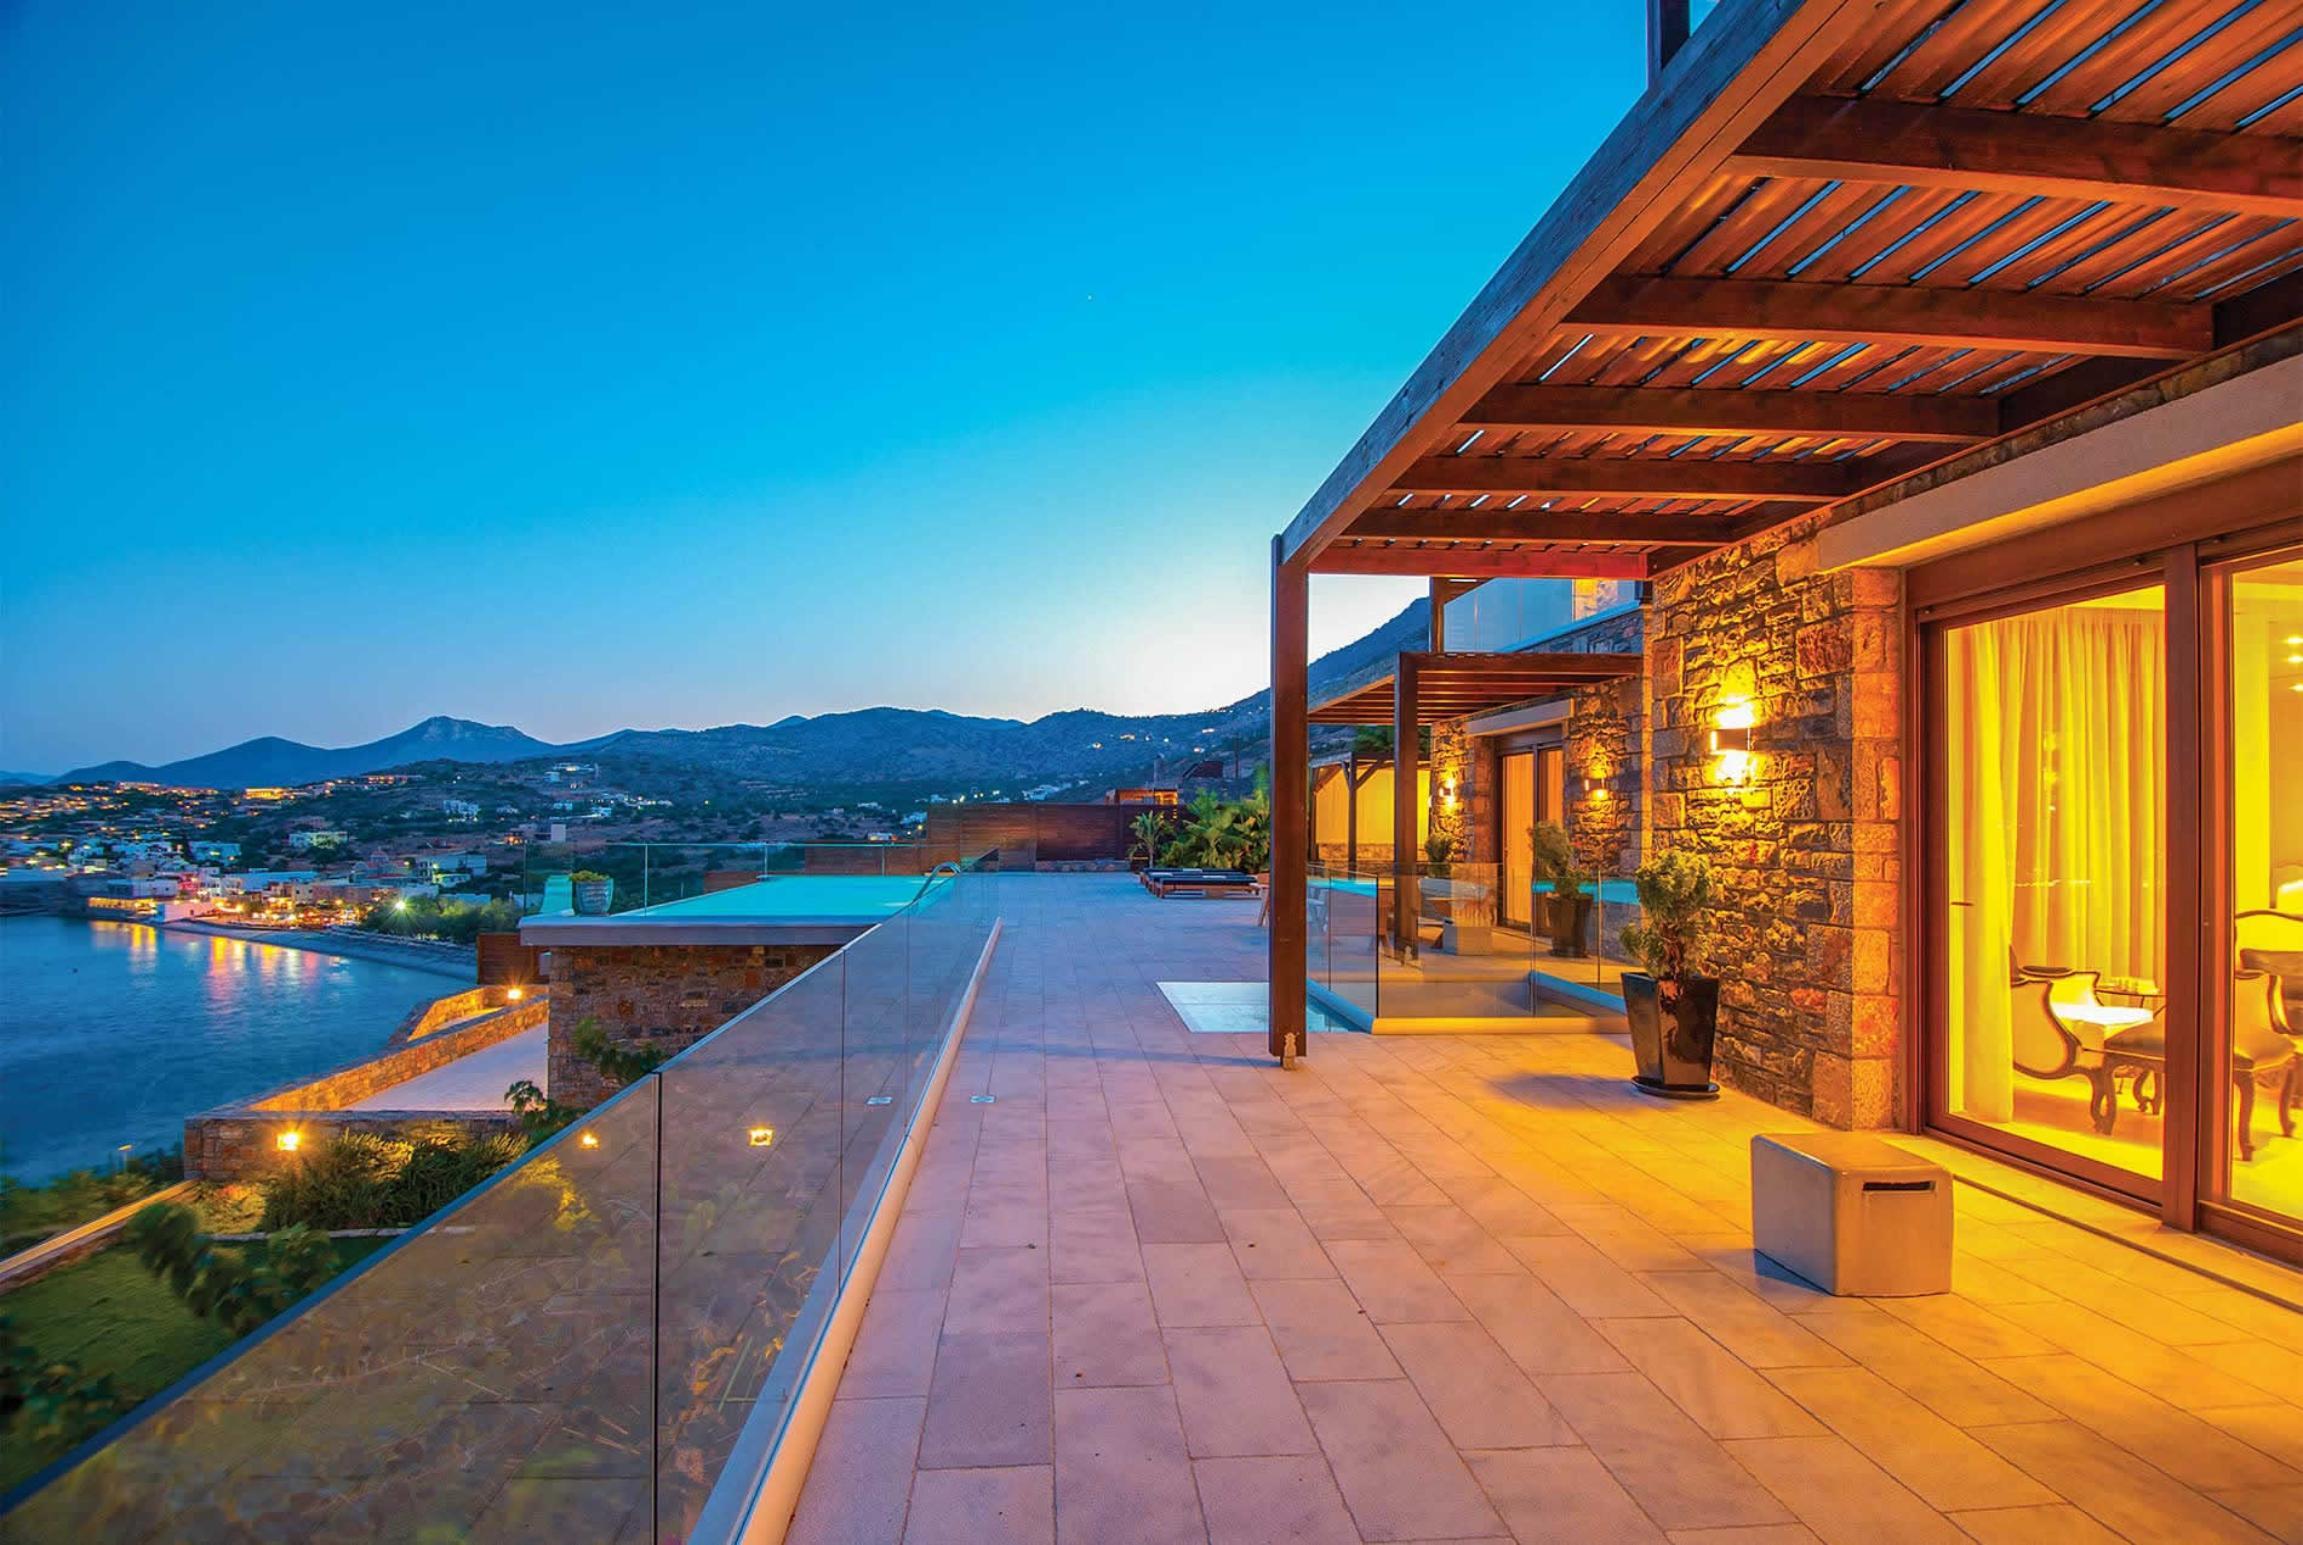 Ferienhaus Danae (2654195), Plaka, Kreta Nordküste, Kreta, Griechenland, Bild 33